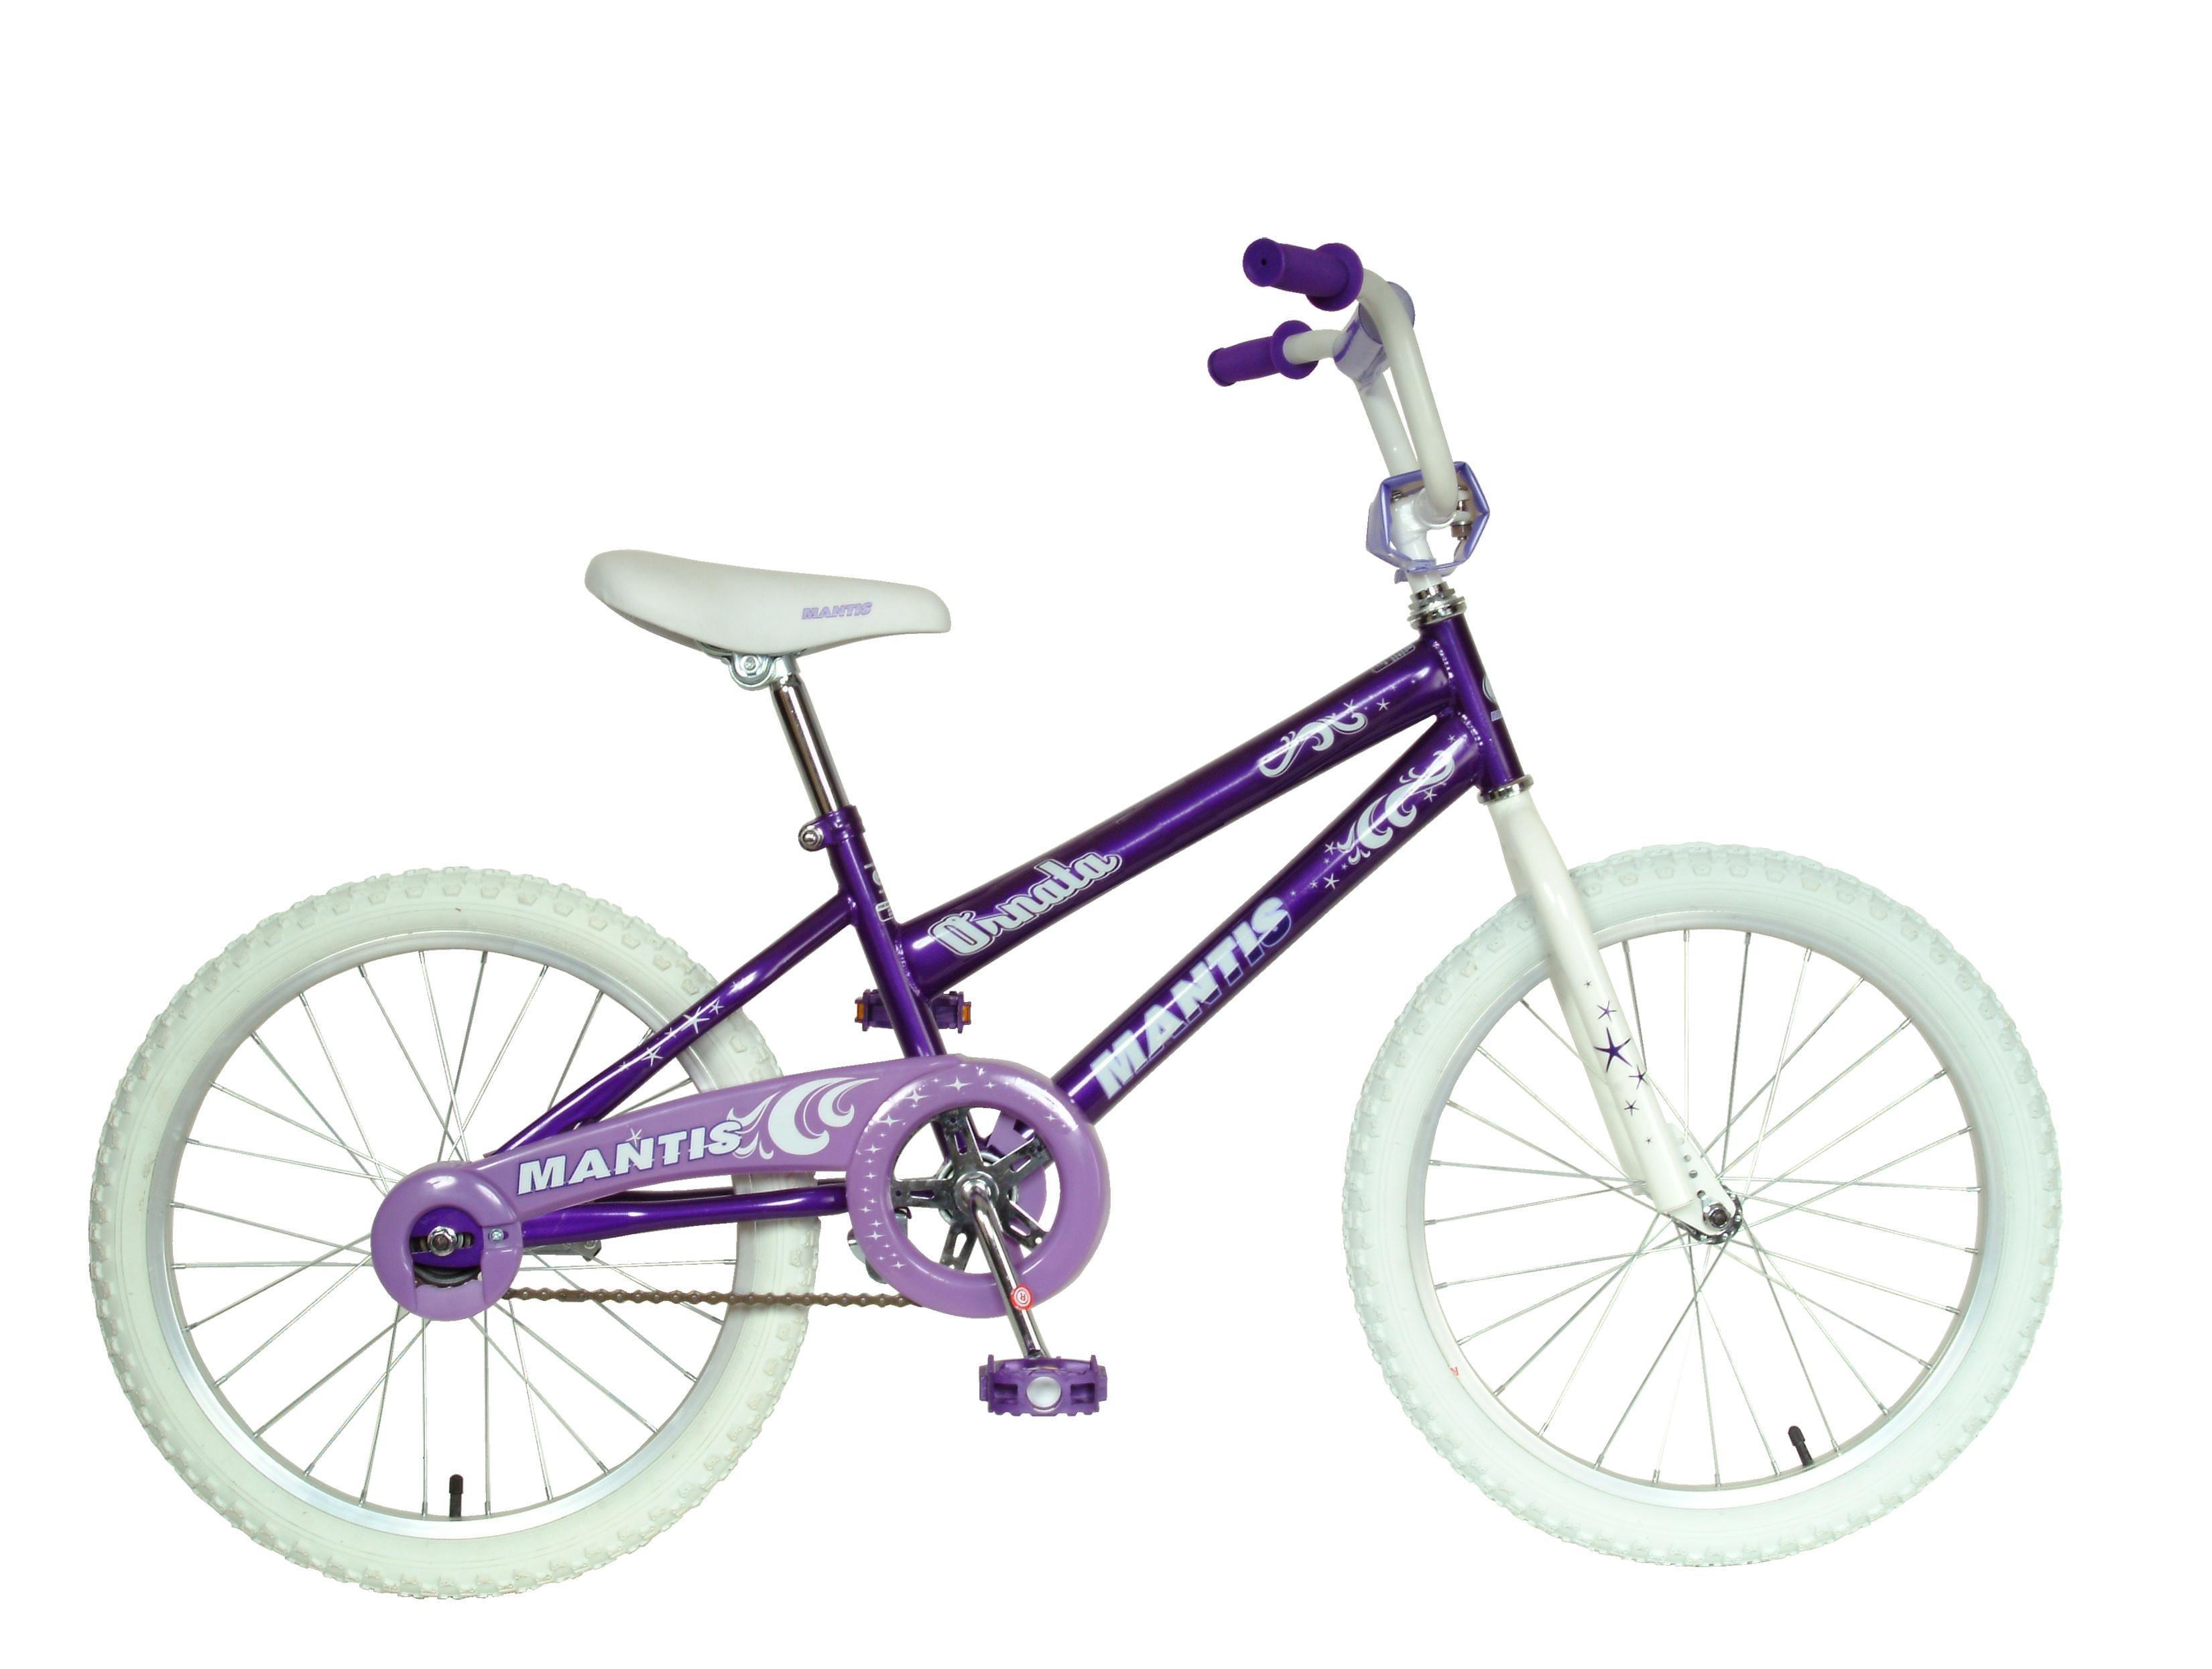 Shop Mantis Ornata Girls 20-Inch Bicycle - Free Shipping -4023